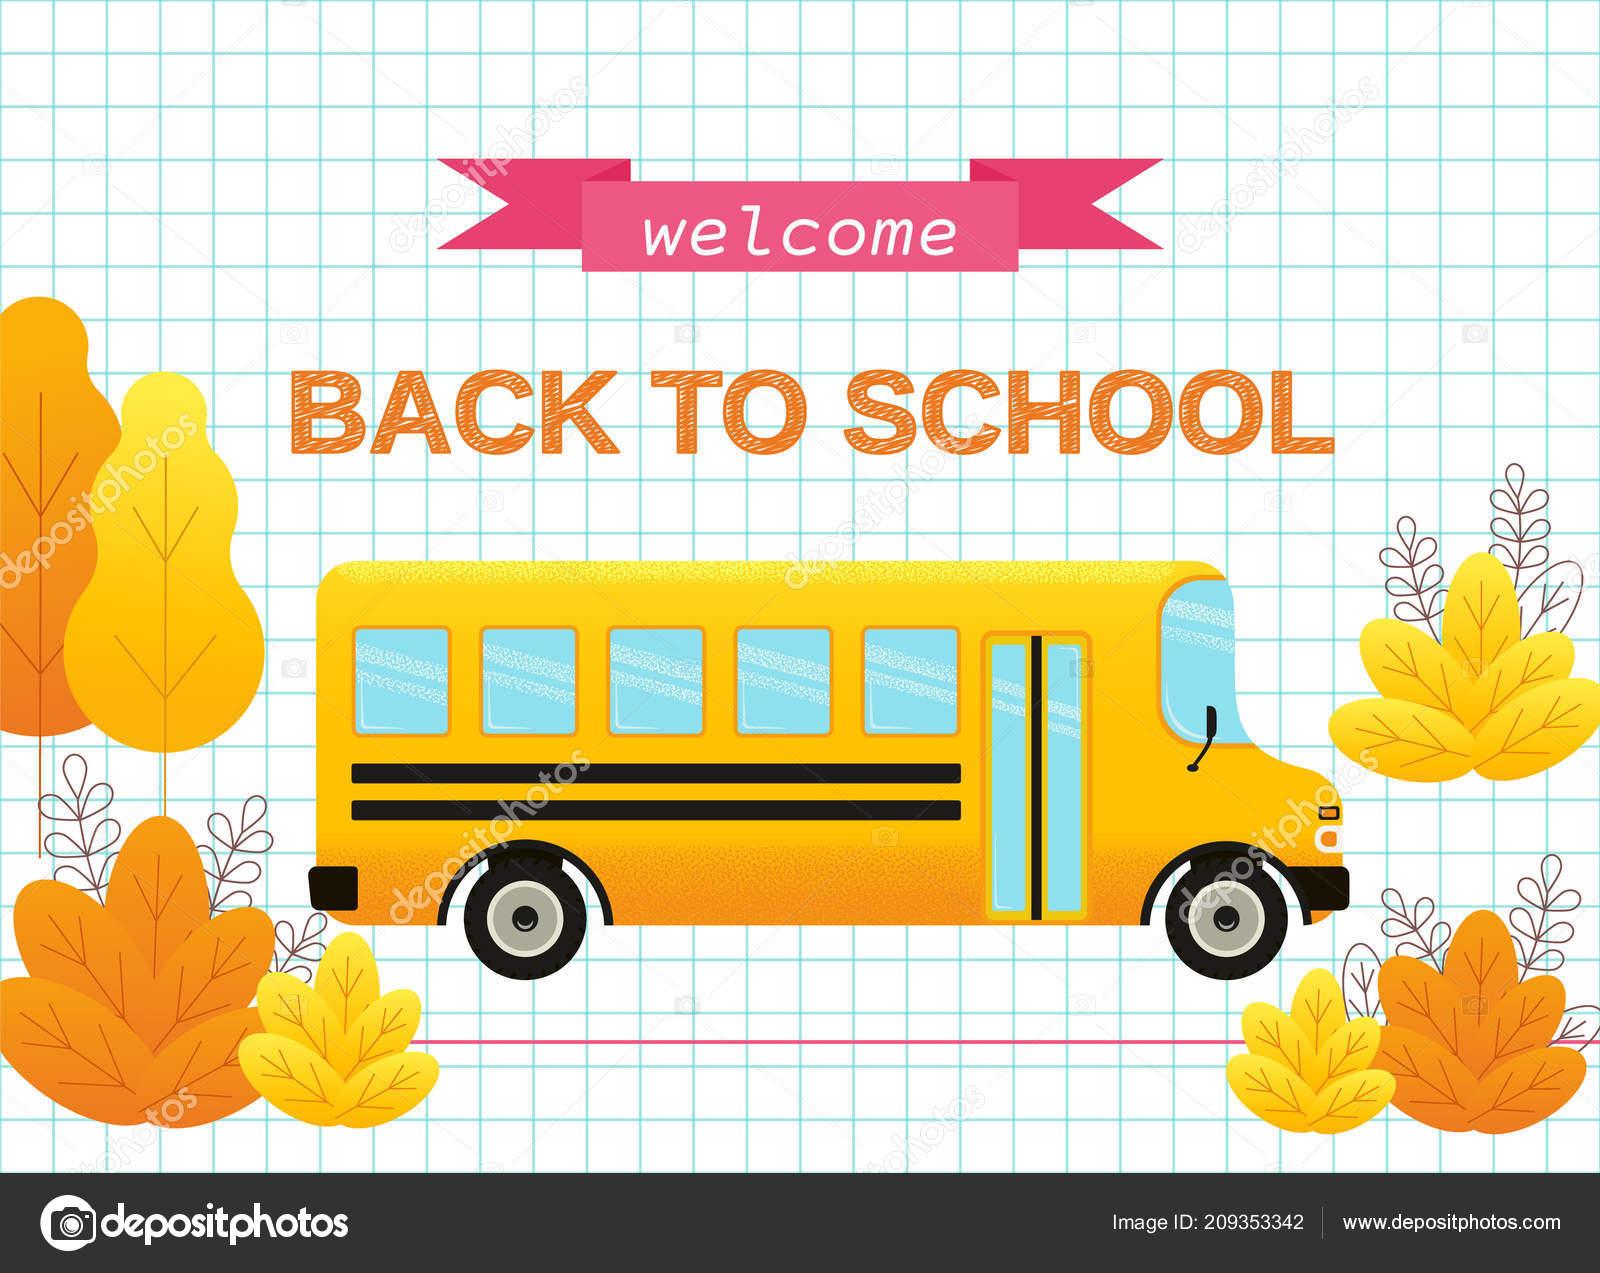 welcome back school banner vector poster text yellow school bus